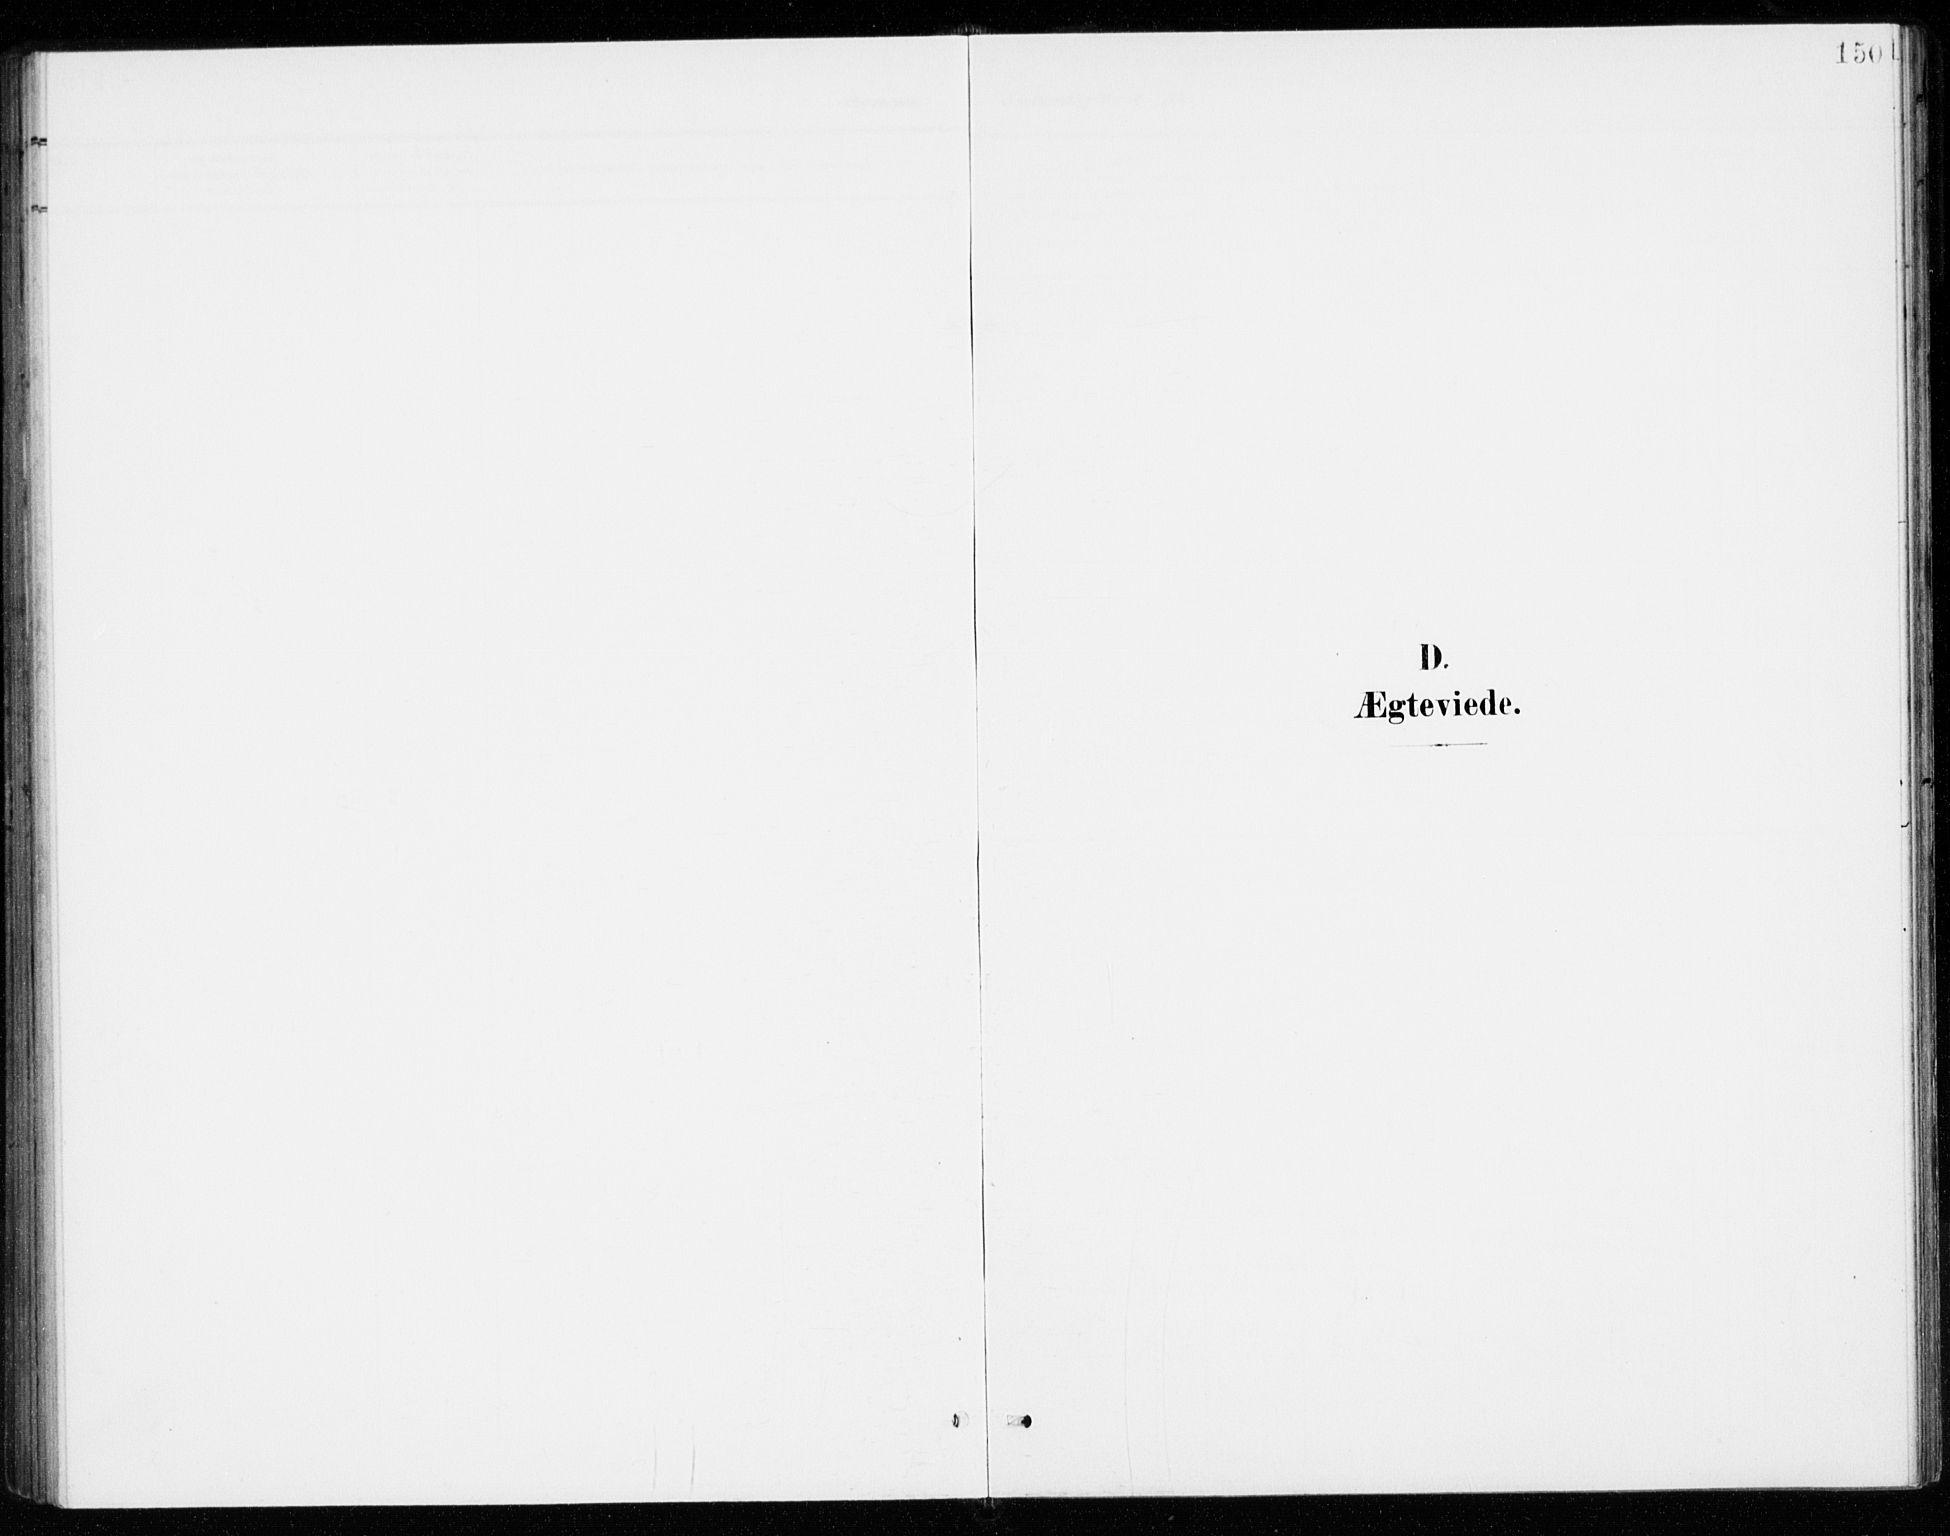 SAO, Gjerdrum prestekontor Kirkebøker, G/Gb/L0001: Klokkerbok nr. II 1, 1901-1944, s. 150